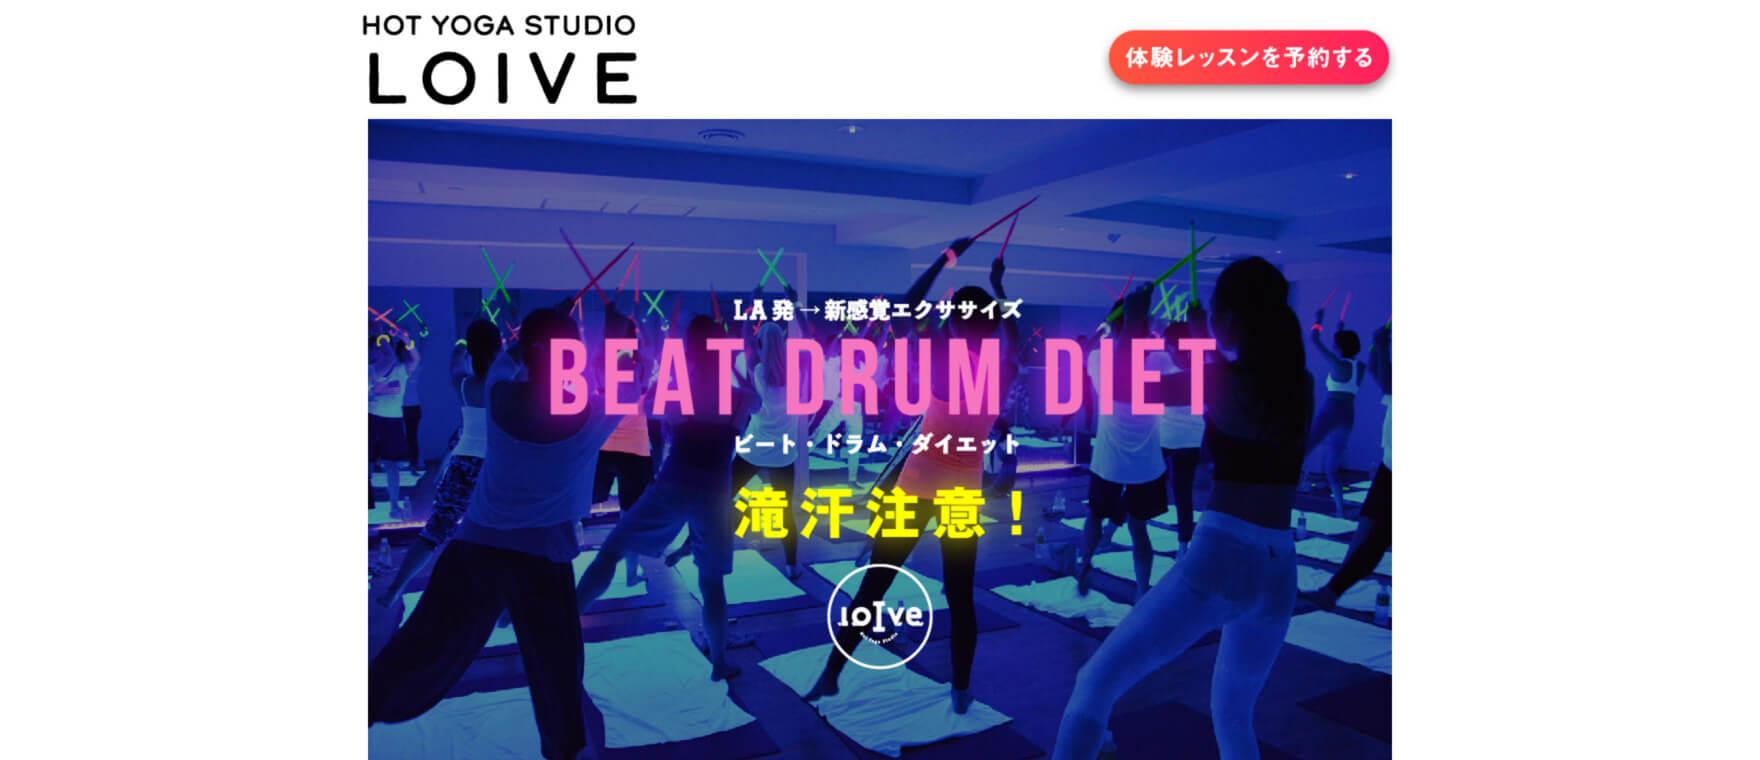 loIve徳島店のイメージ画像